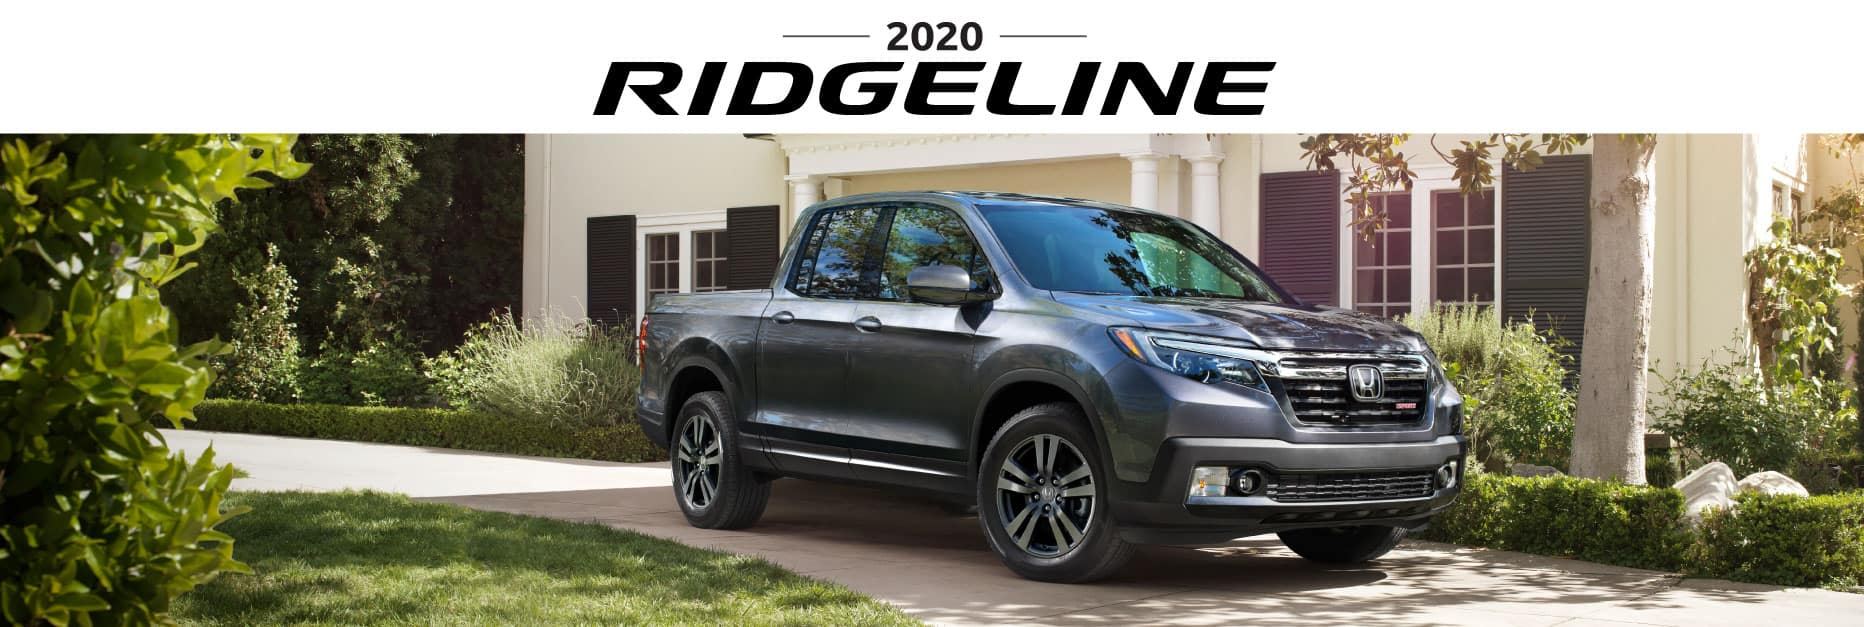 Header Photo of the 2020 Honda Ridgeline